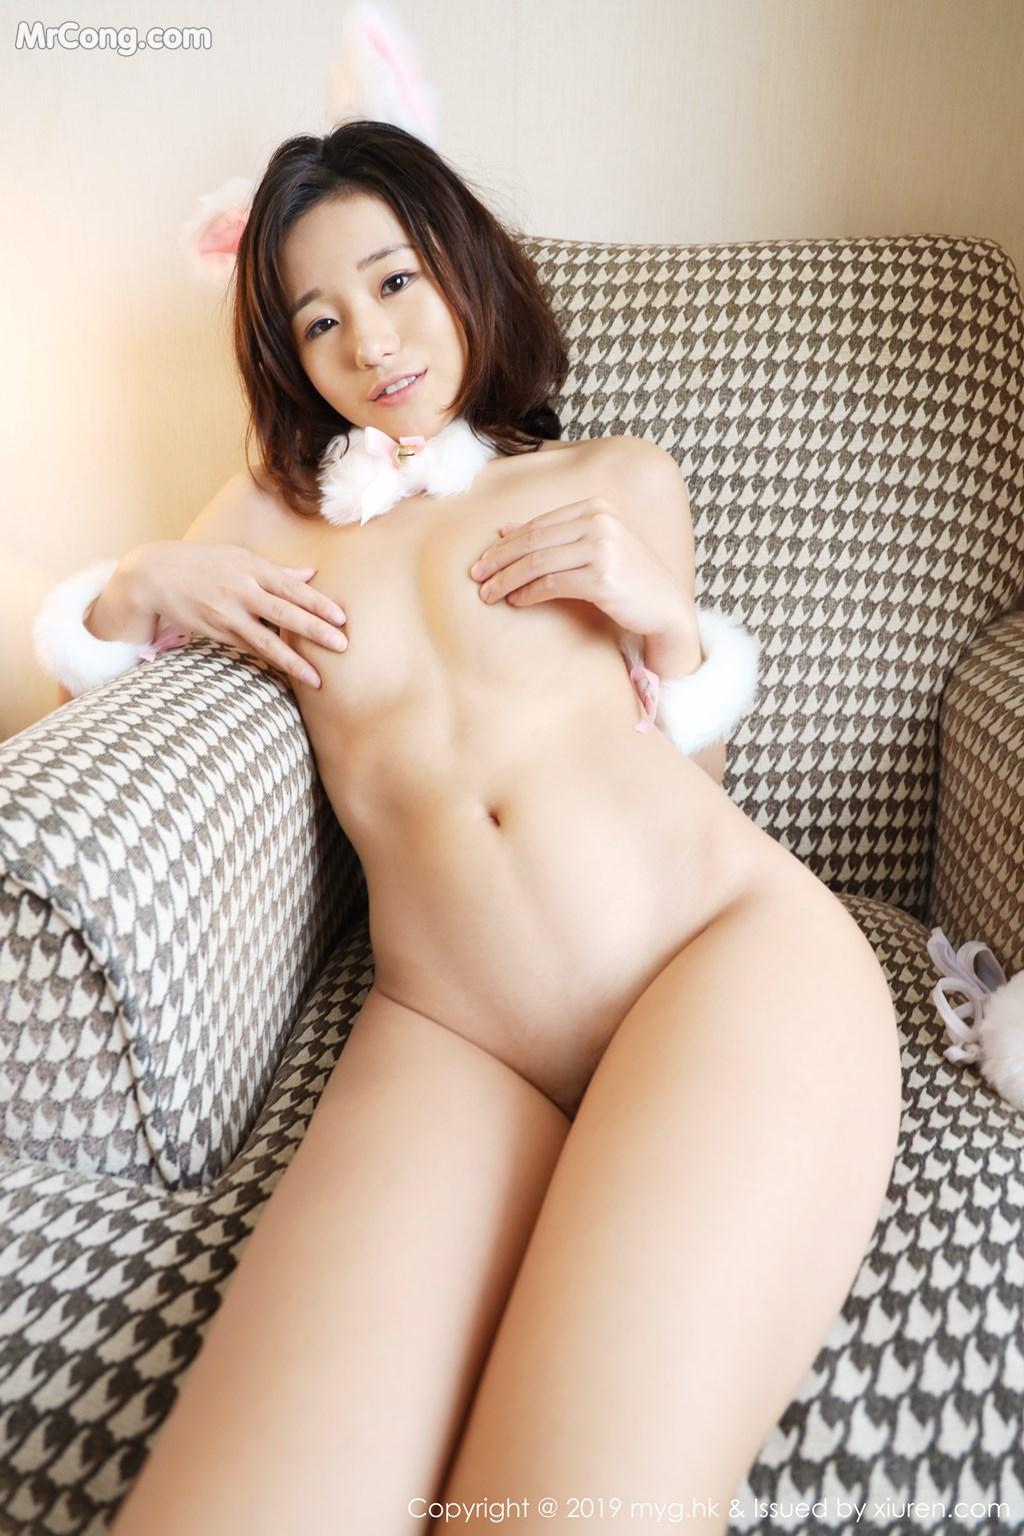 Image MyGirl-Vol.349-Cang-Jing-You-Xiang-MrCong.com-034 in post MyGirl Vol.349: Cang Jing You Xiang (仓井优香) (51 ảnh)